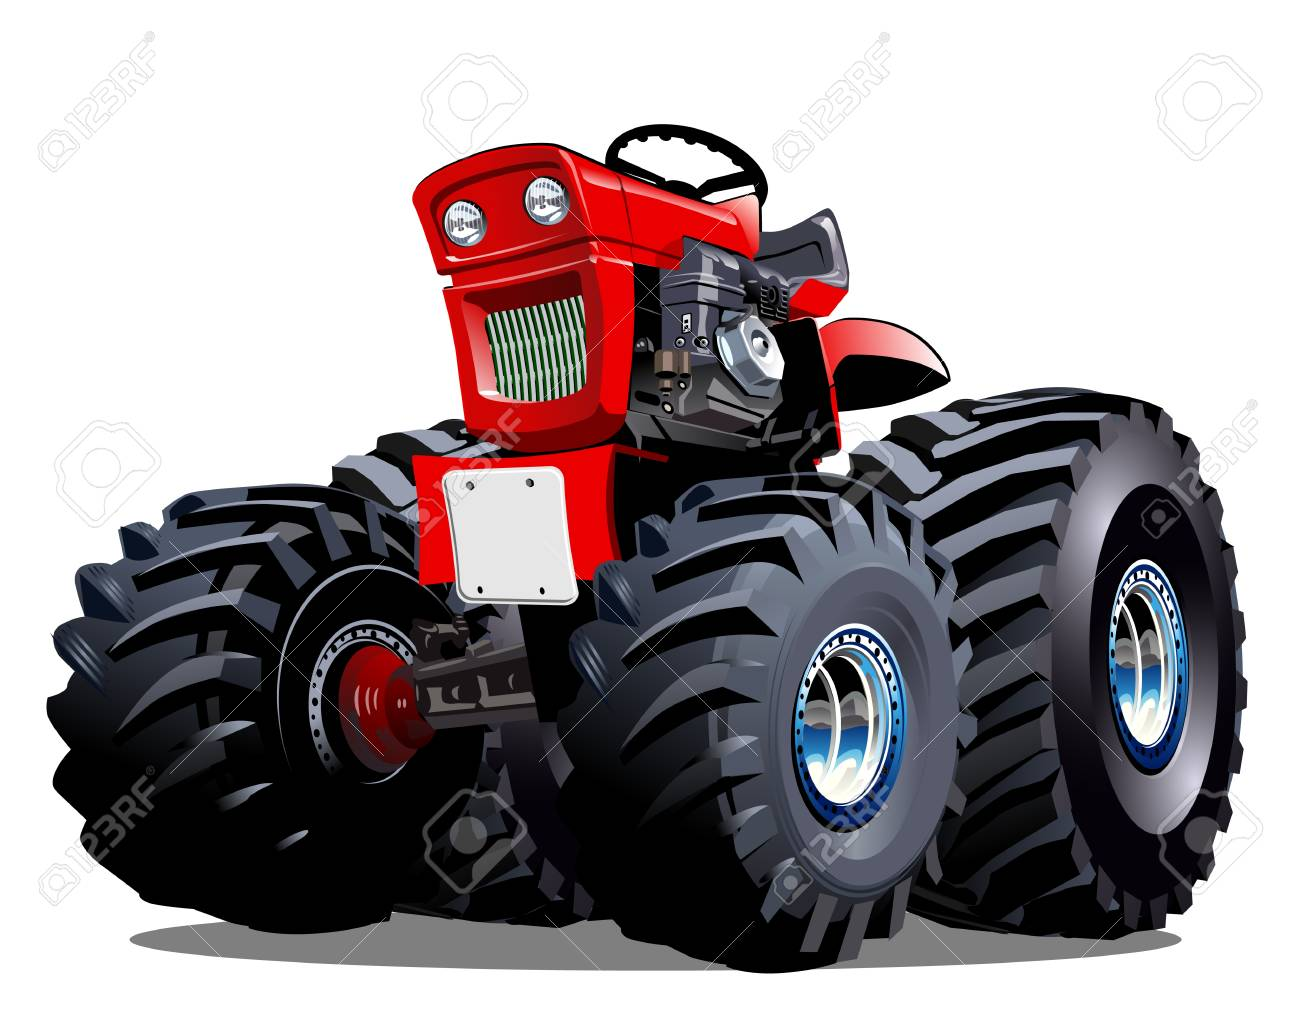 Vektor Cartoon Traktor Erhältlich Eps 10 Vektor Format Von Gruppen